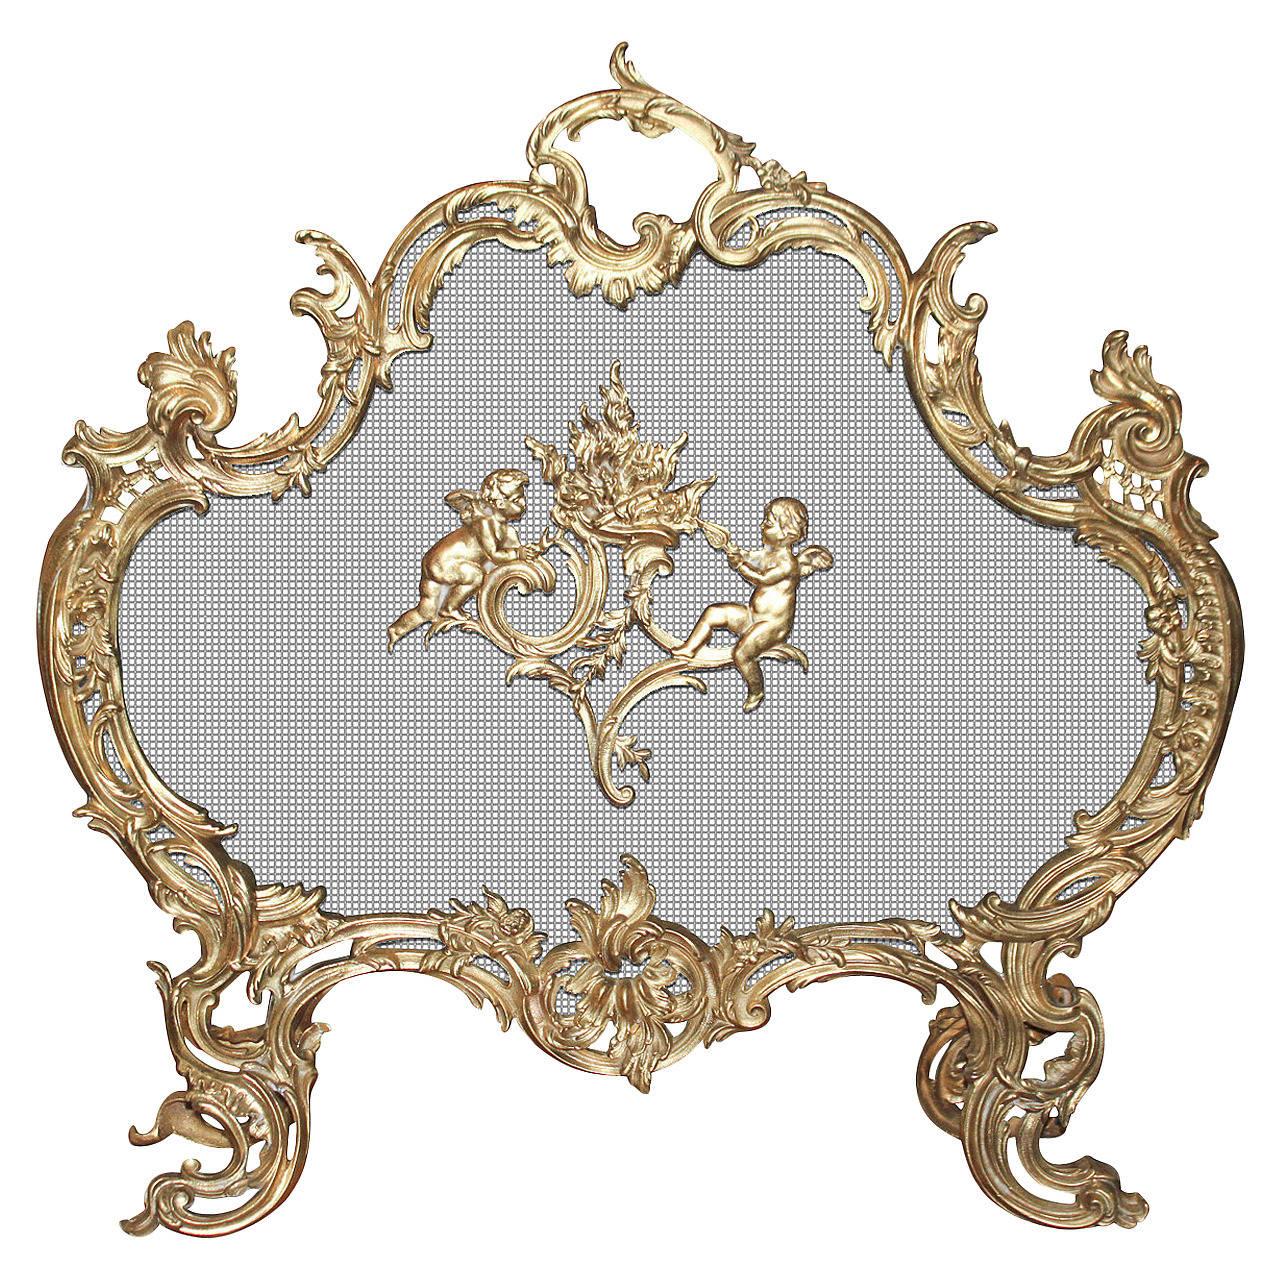 1 Only Antique Ornate Rococo Gilt Bronze Decorative Furniture Mount